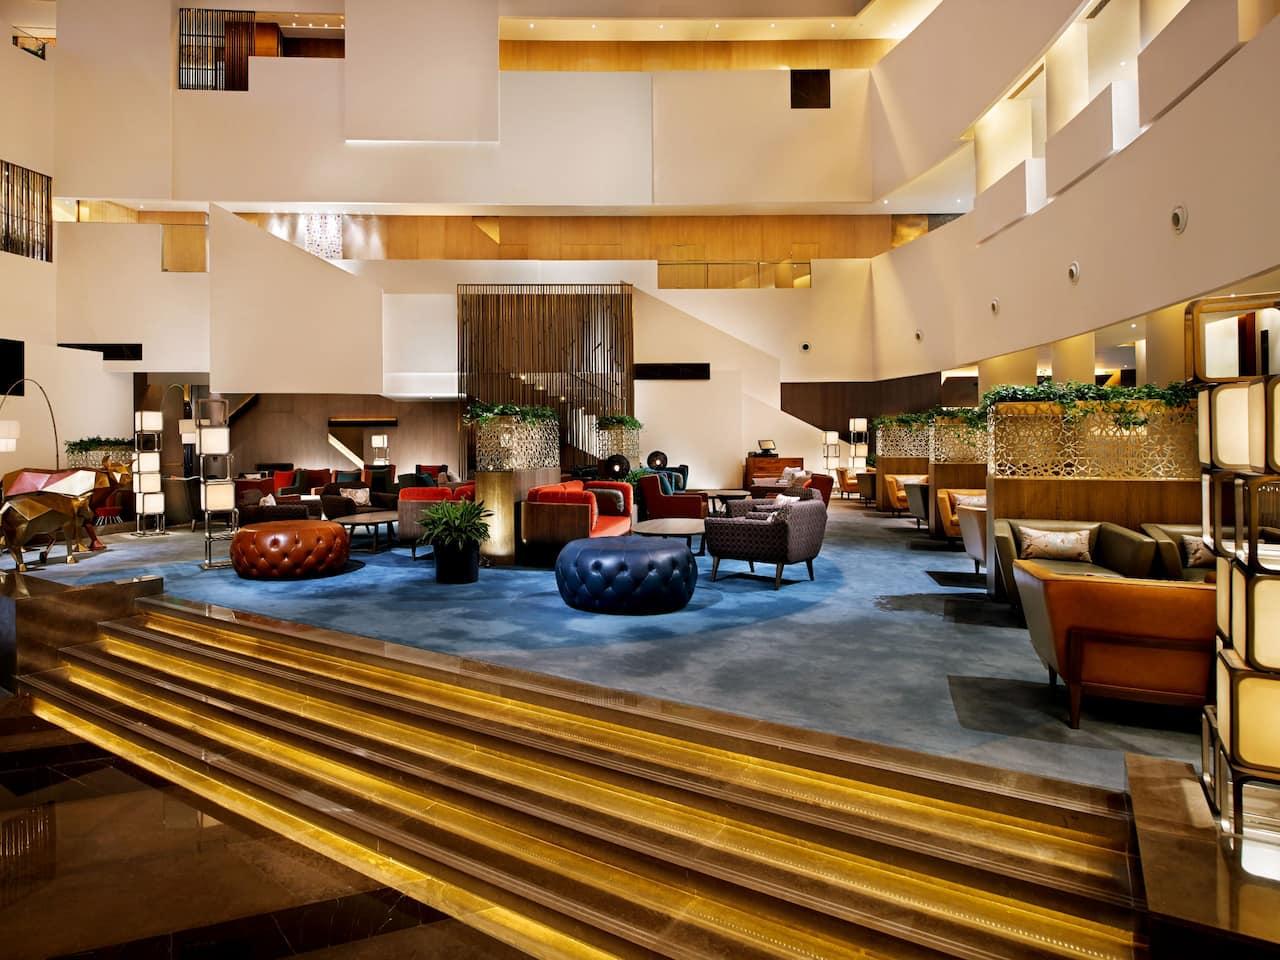 Atrium 中庭餐厅一览